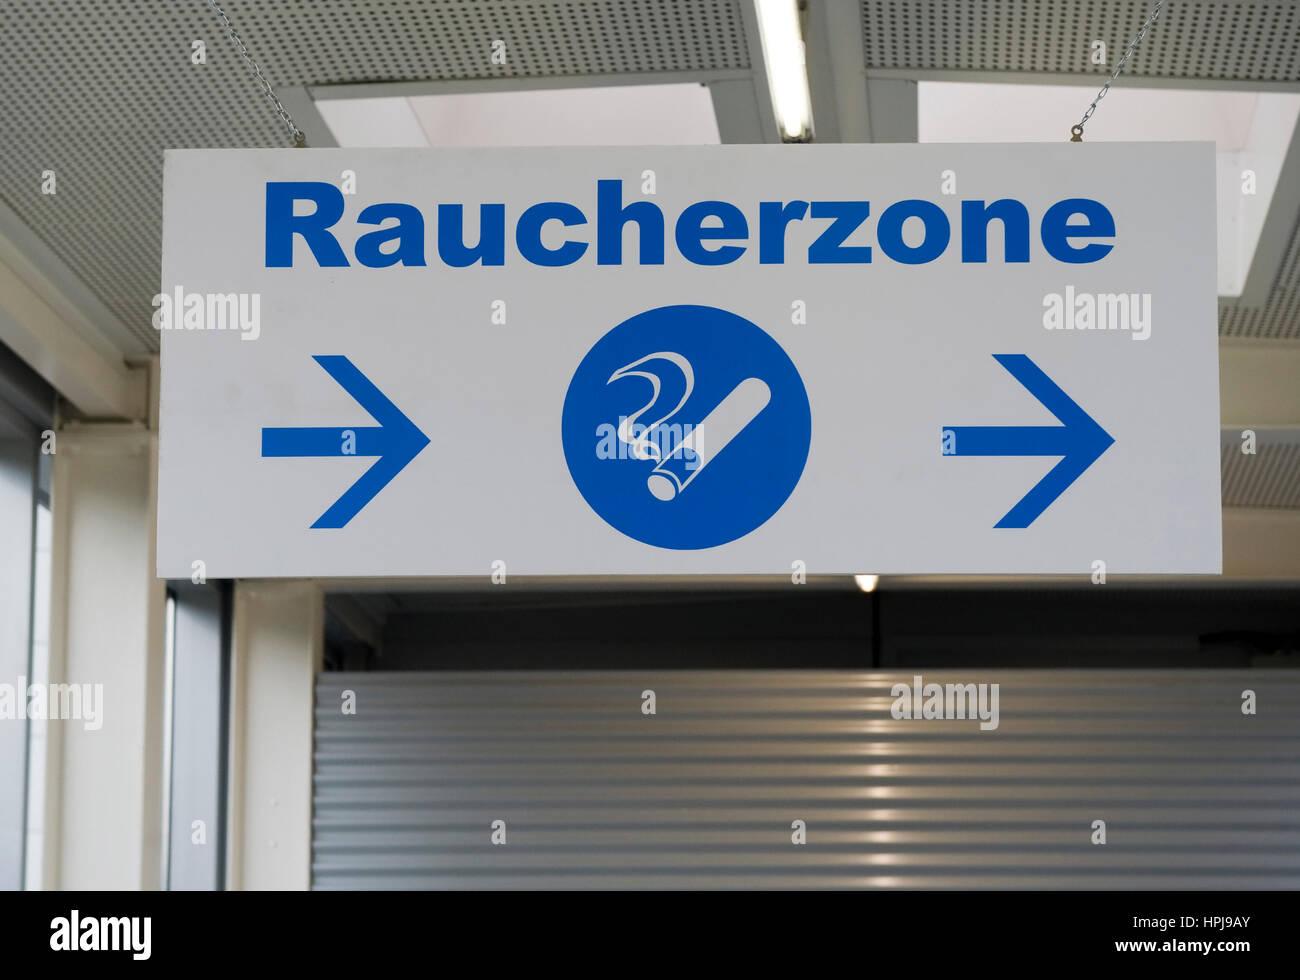 Wegweiser Raucherzone - shild for smoking area - Stock Image